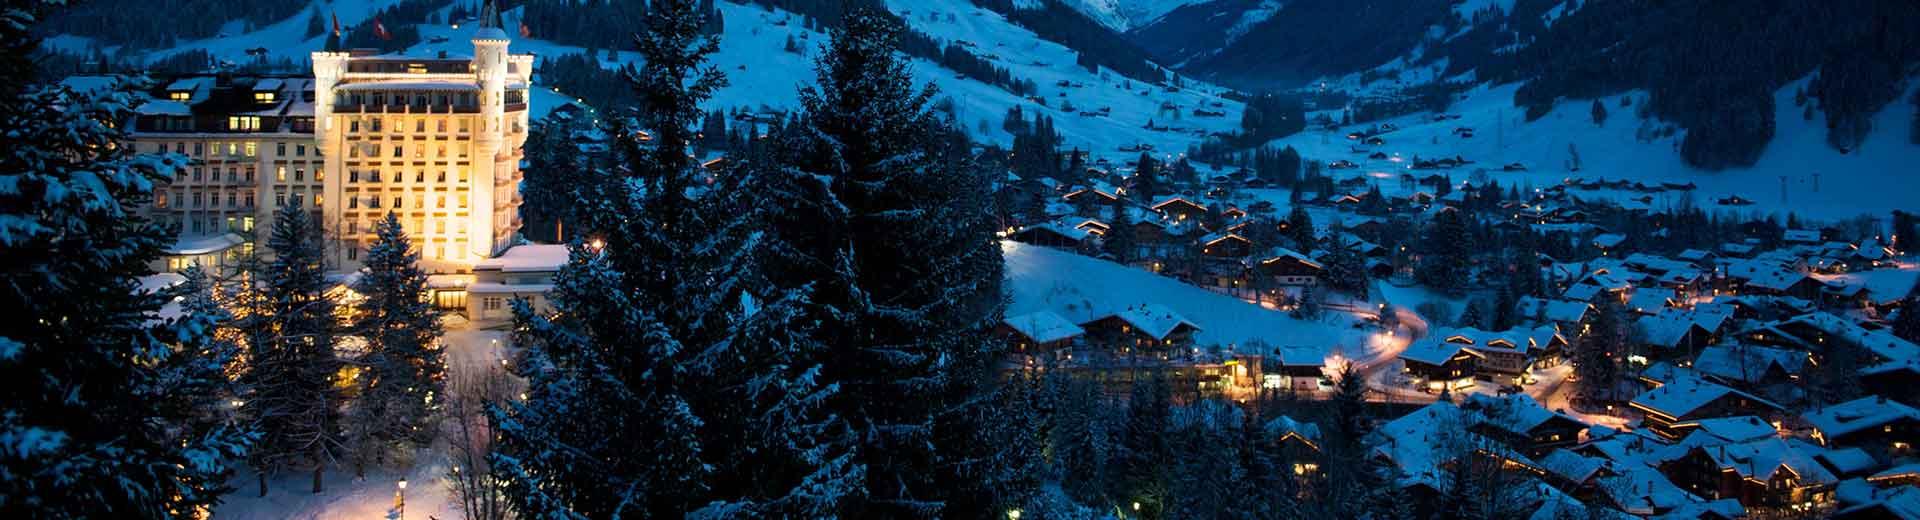 gstaad palace switzerland winter snow